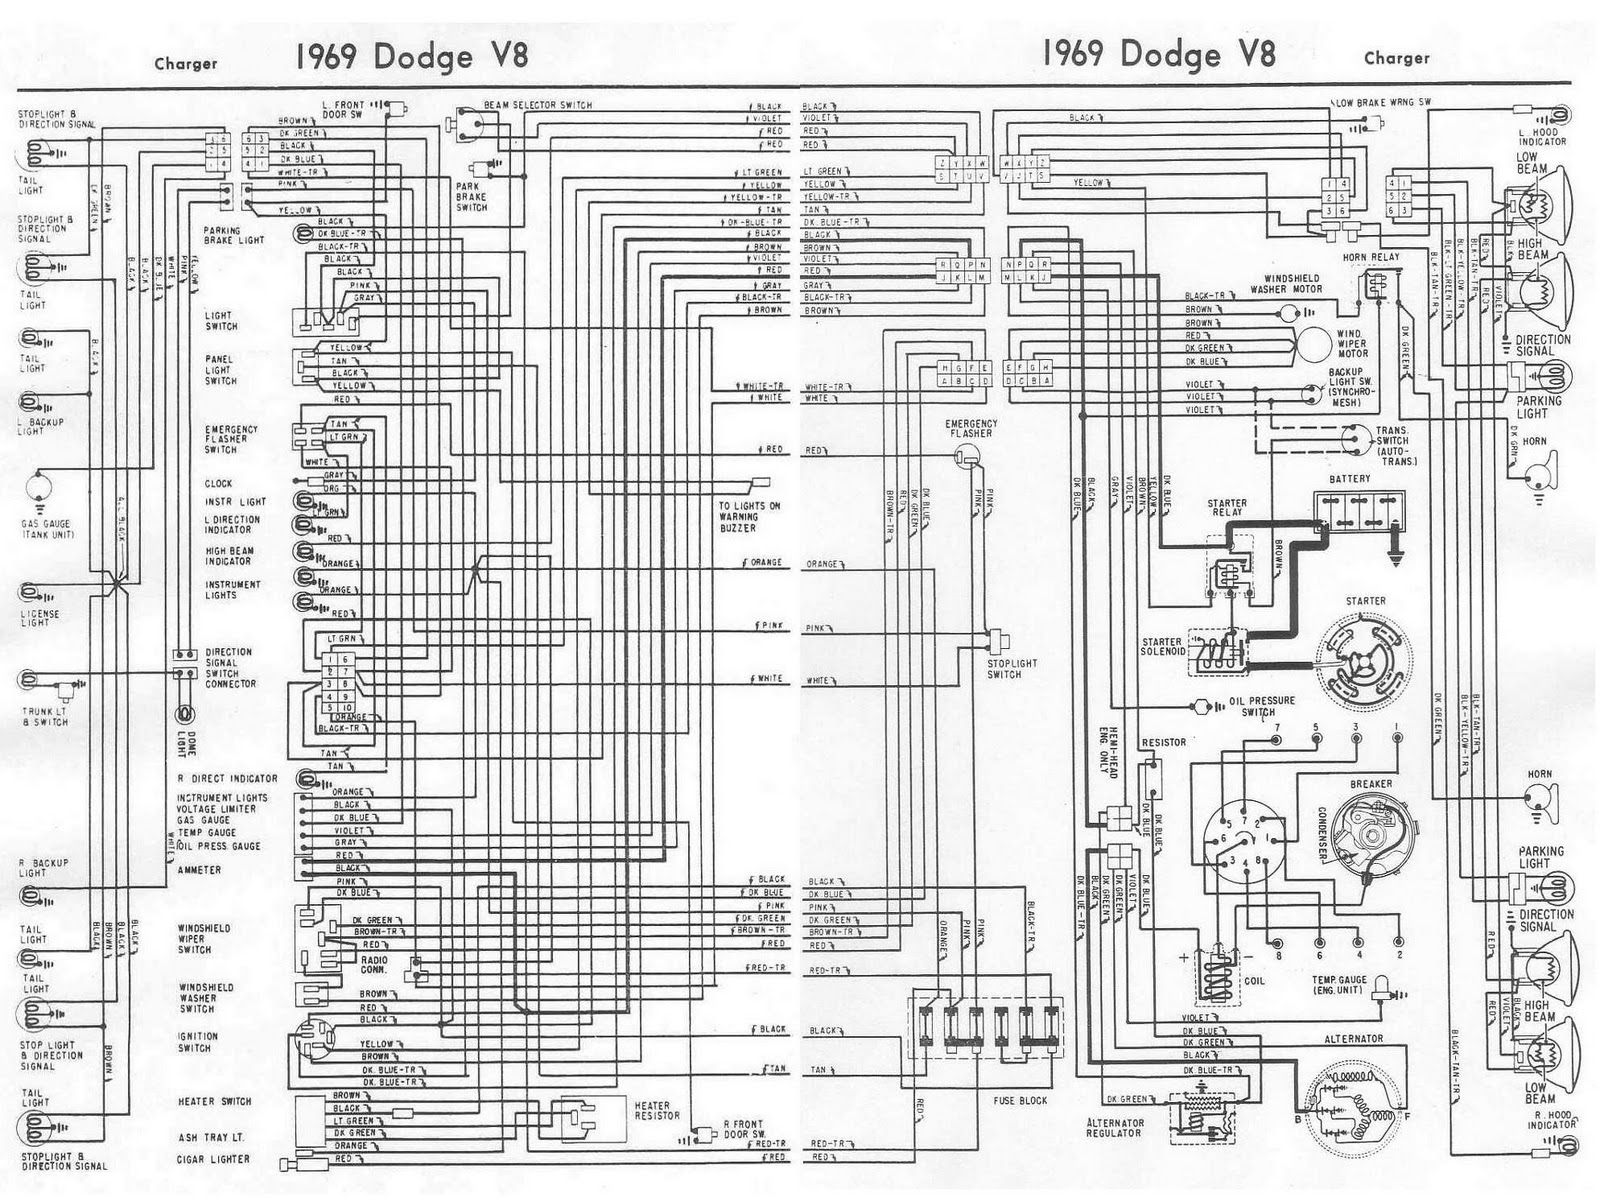 Ziemlich 1968 Ford Mustang Schaltplan Ideen - Schaltplan Serie ...